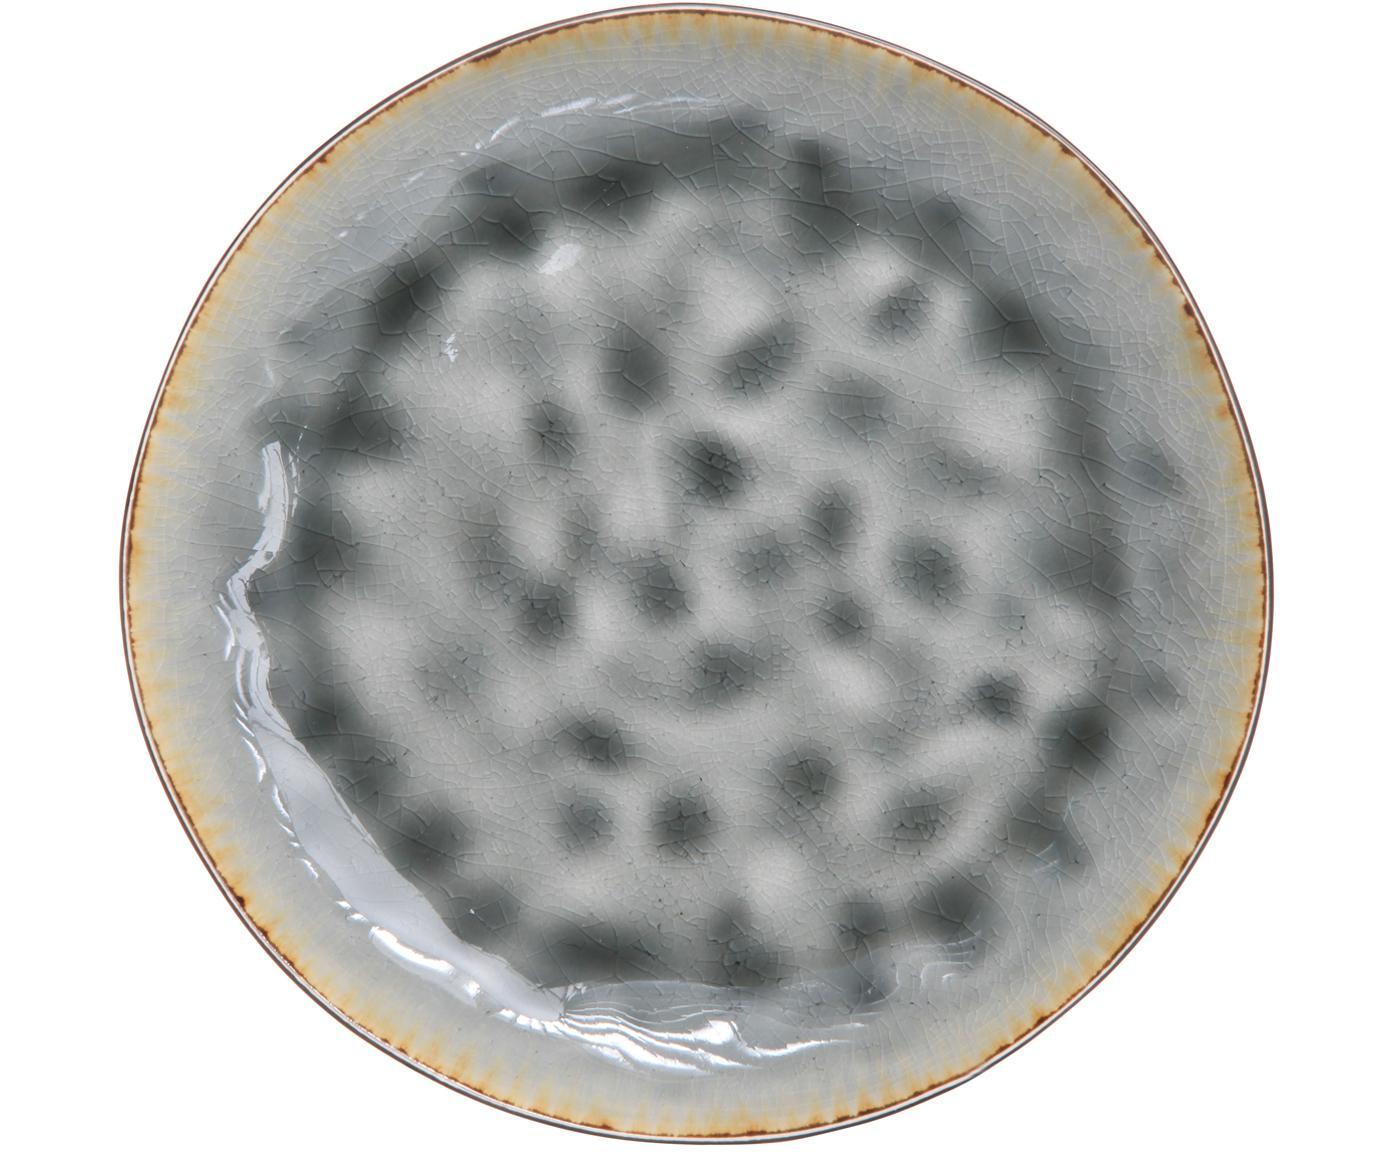 Ontbijtbord Lagune, 6 stuks, Keramiek, Grijsbruin, grijstinten, Ø 20 cm